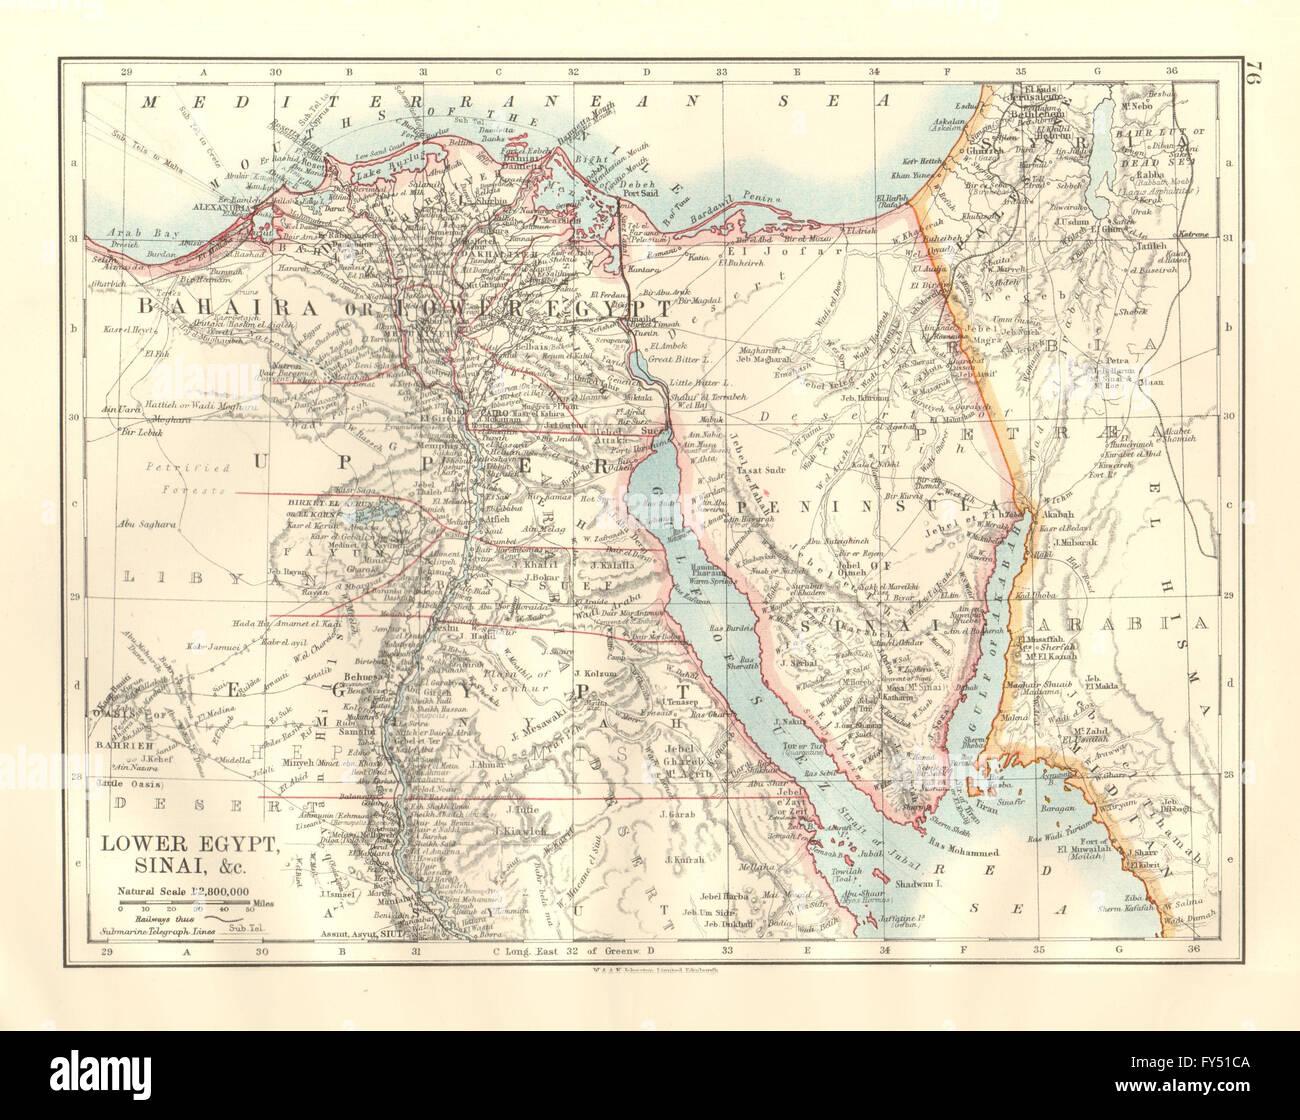 LOWER EGYPT SINAI Provinces Nile Valleydelta Railways Stock - Map of egypt 1920